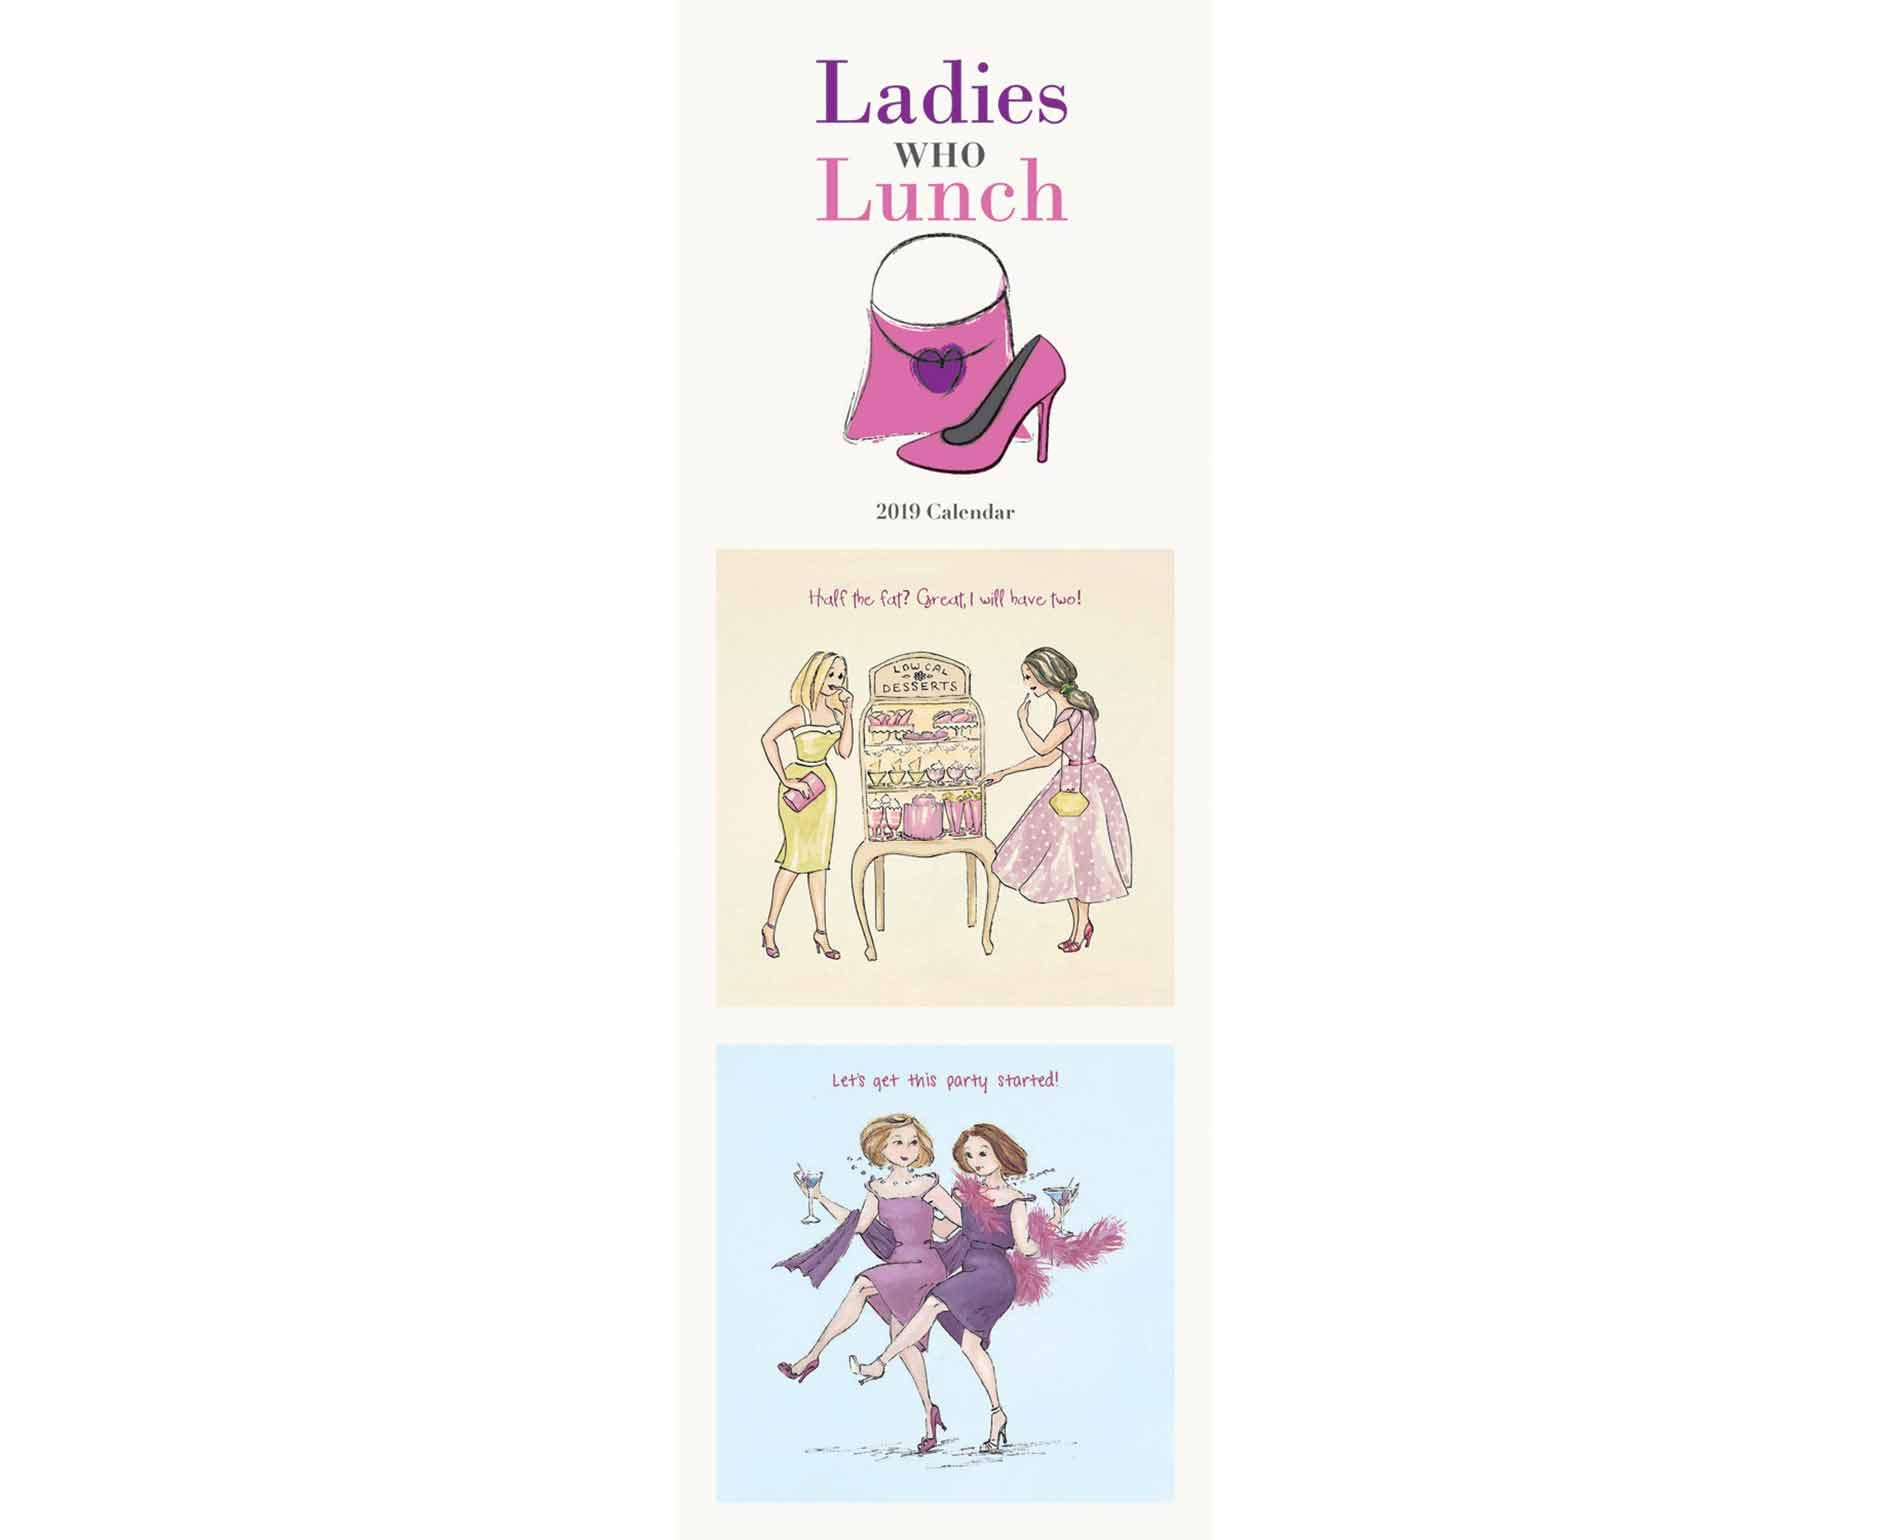 Ladies Who Lunch S 2019 (Slim Standard) Paperback – 13 Aug 2018 Carousel Calendars 2019 1786669110 Schreibwaren (bedruckt)